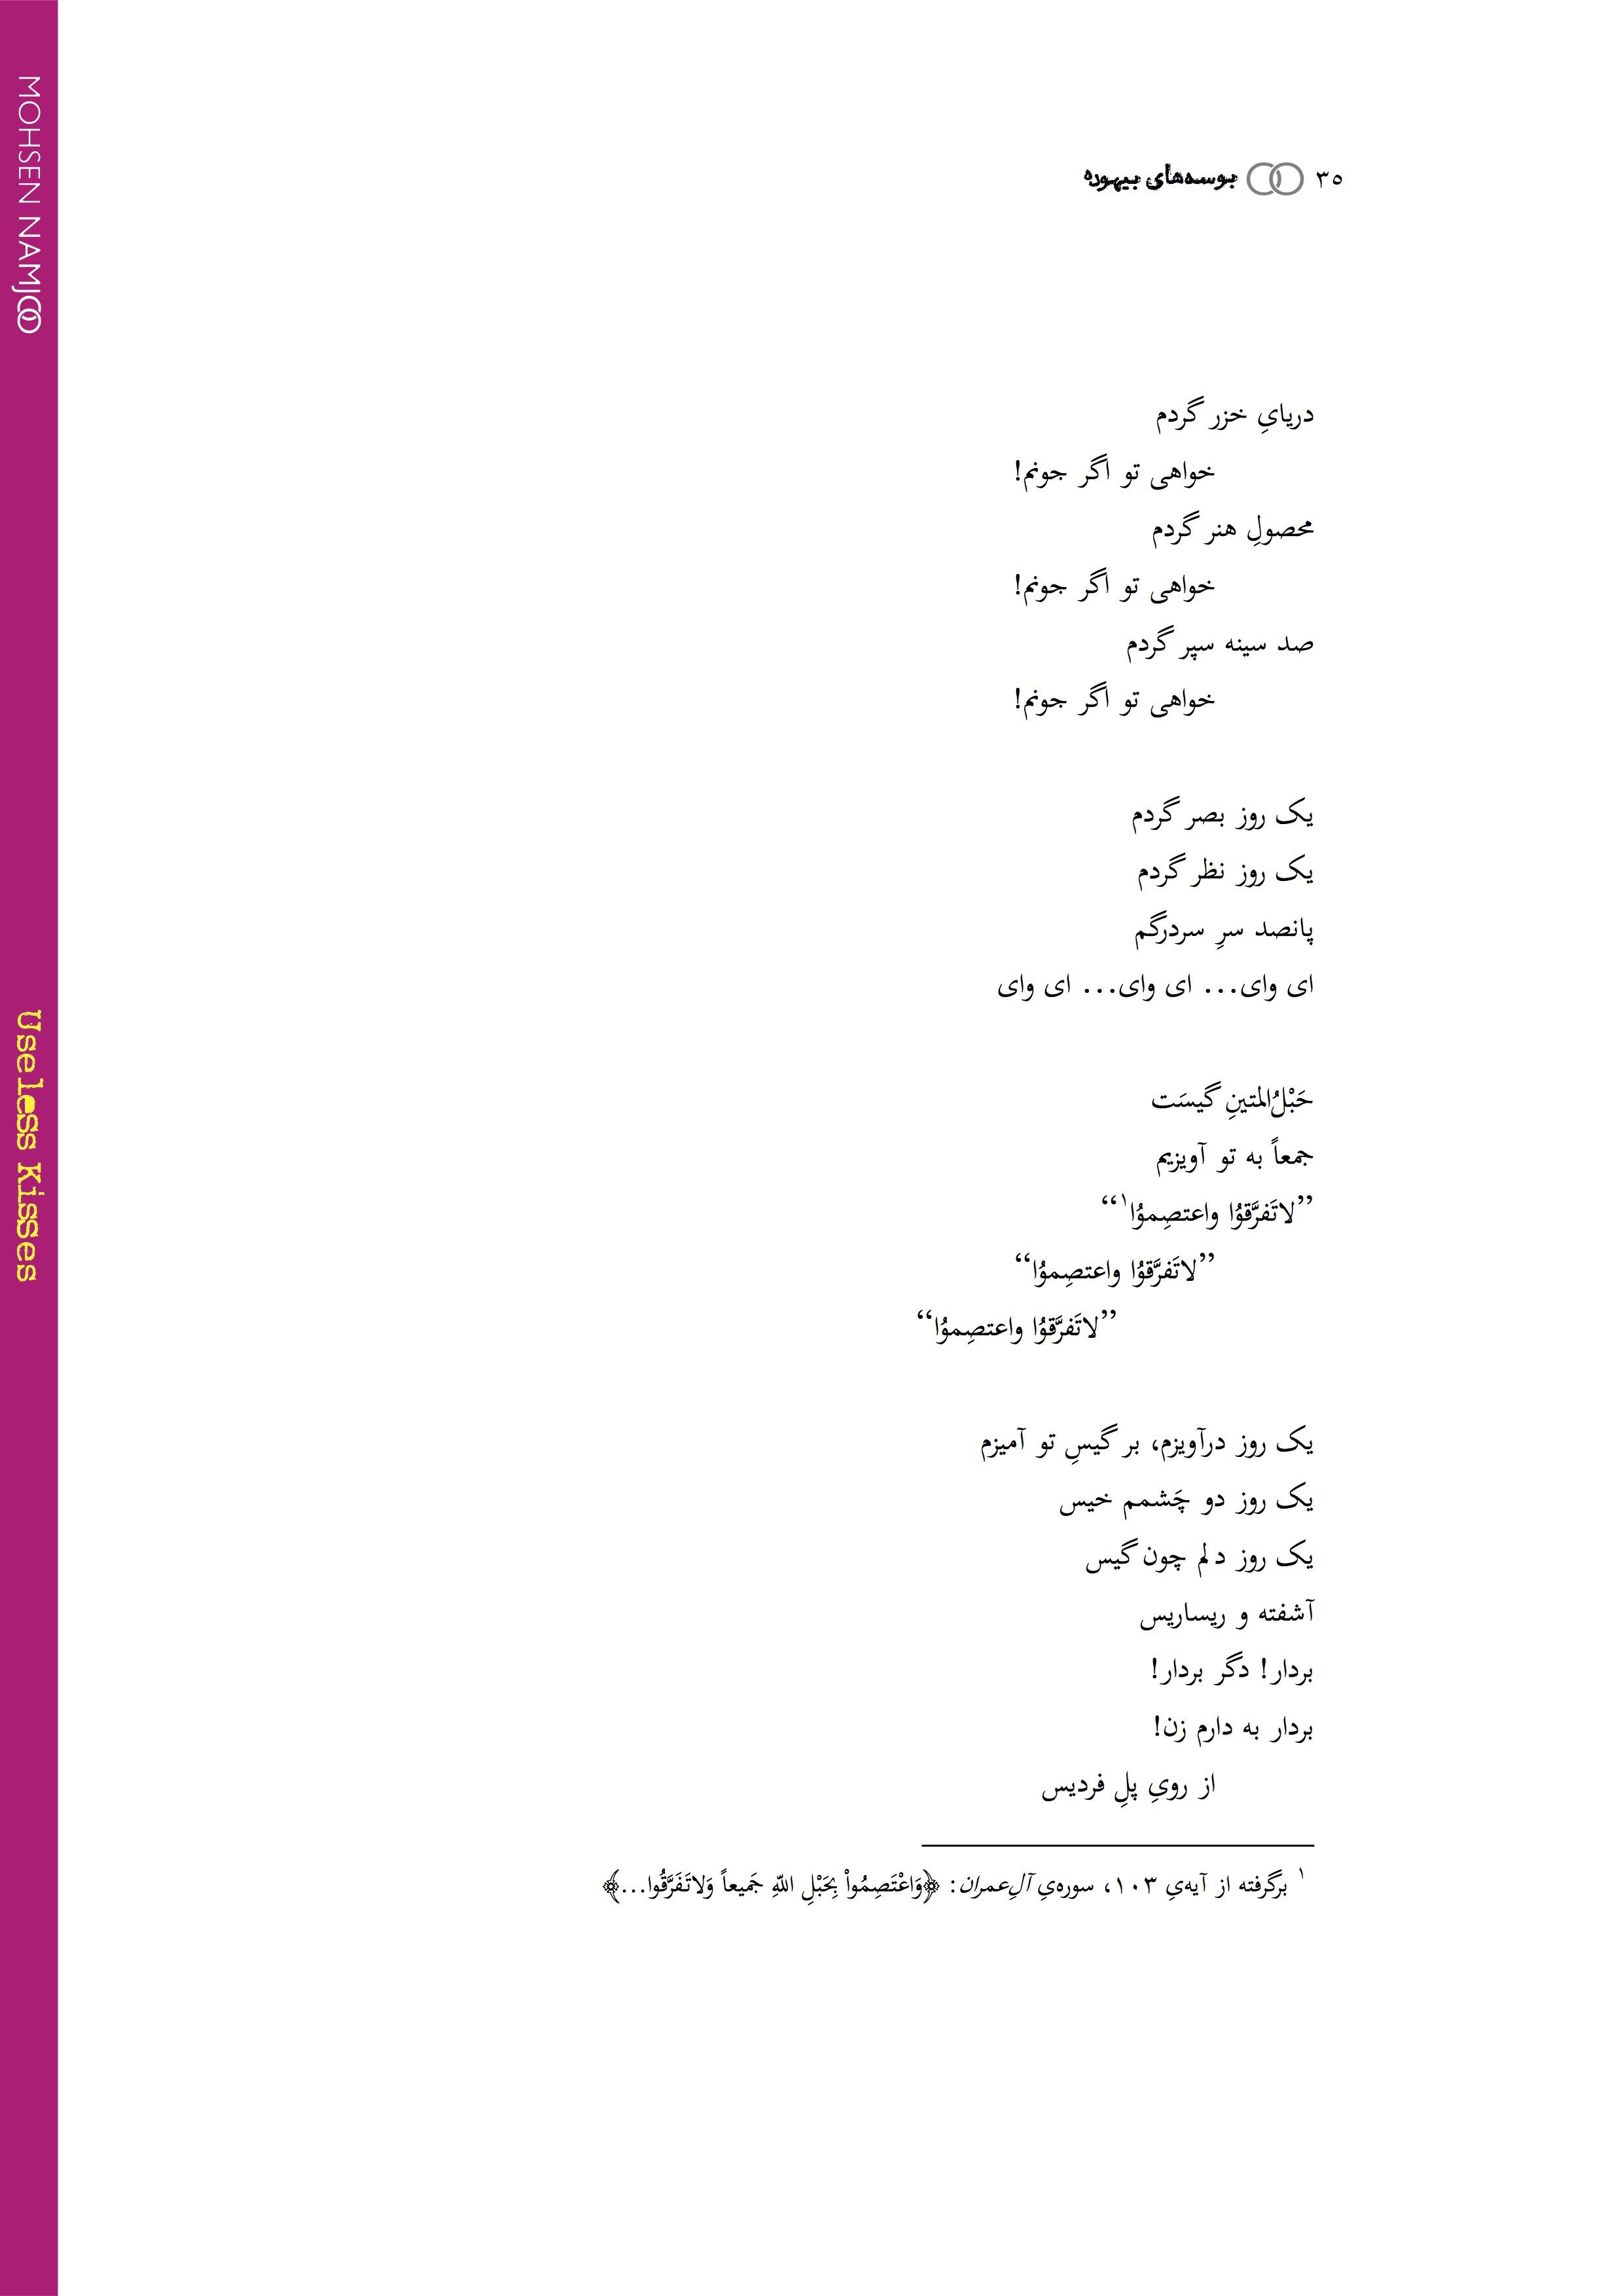 34Useless Kisses eBook (2nd Edition).jpg